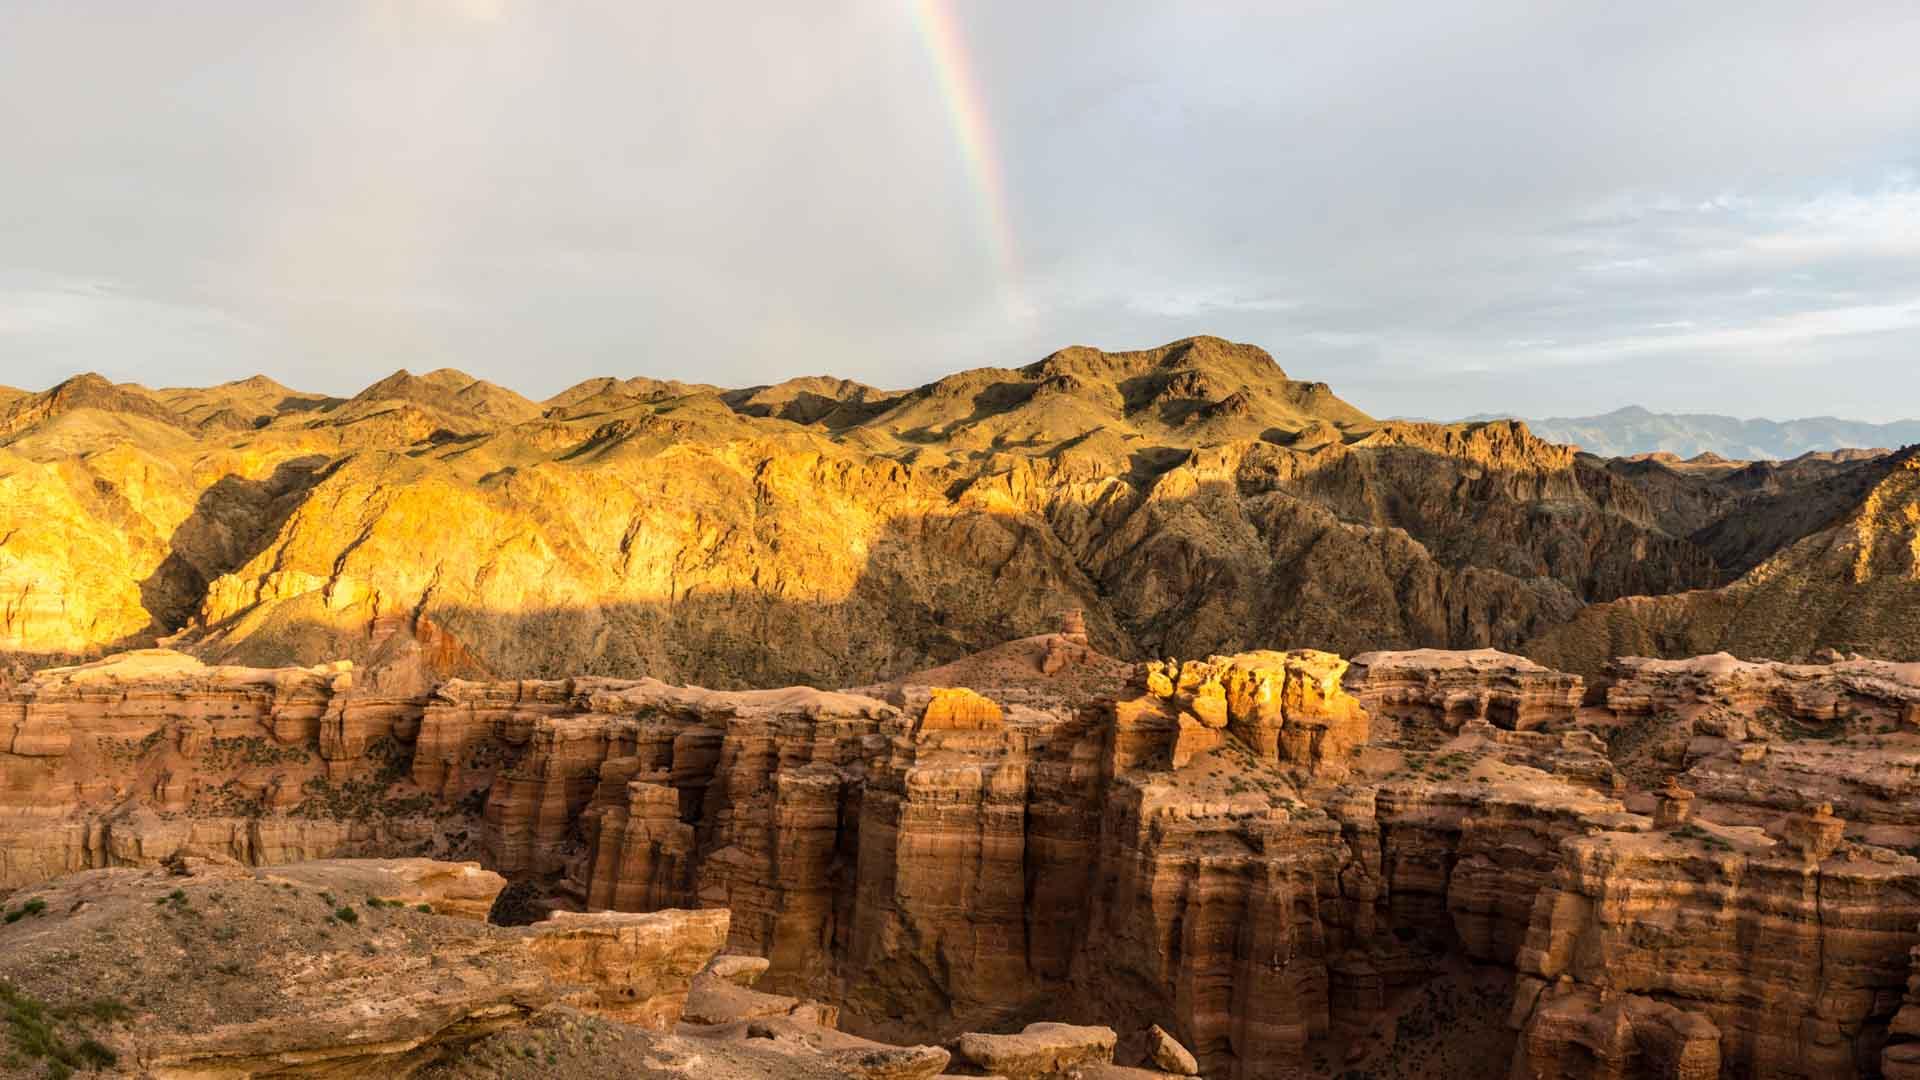 SerialHikers stop autostop world monde tour hitchhiking aventure adventure alternative travel voyage sans avion no fly Kazakhstan Charyn canyon rainbow arc-en-ciel